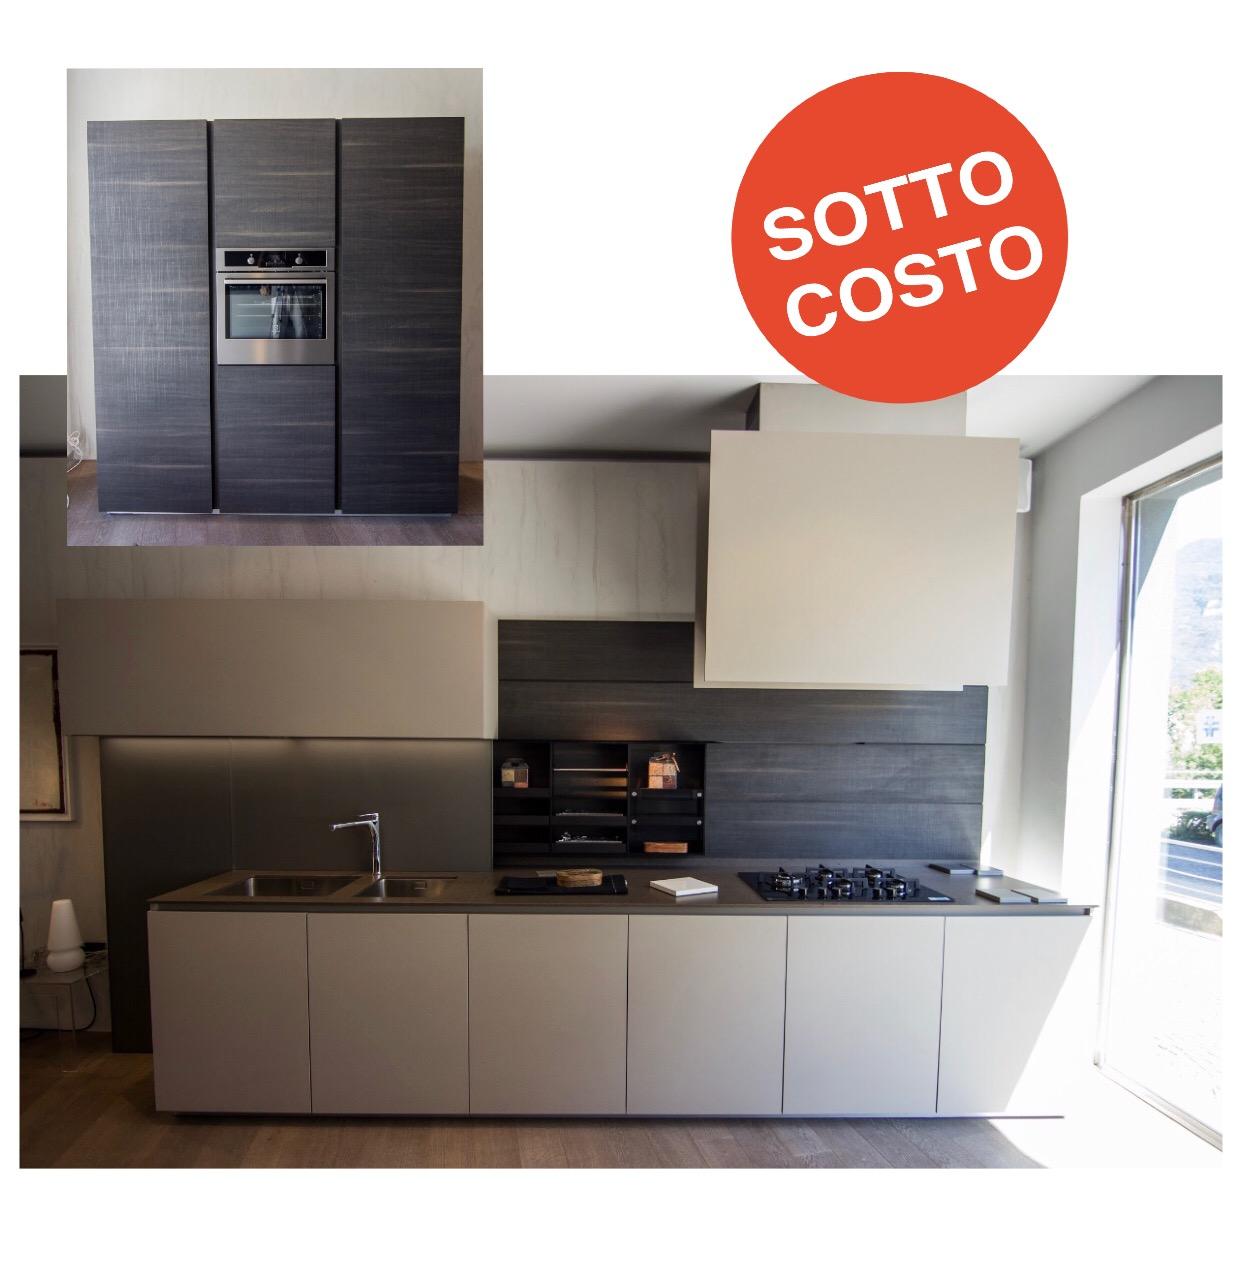 Cucina Modulnova mod.Mh6 Listino € 24.580,00 NETTO € 10.000,00